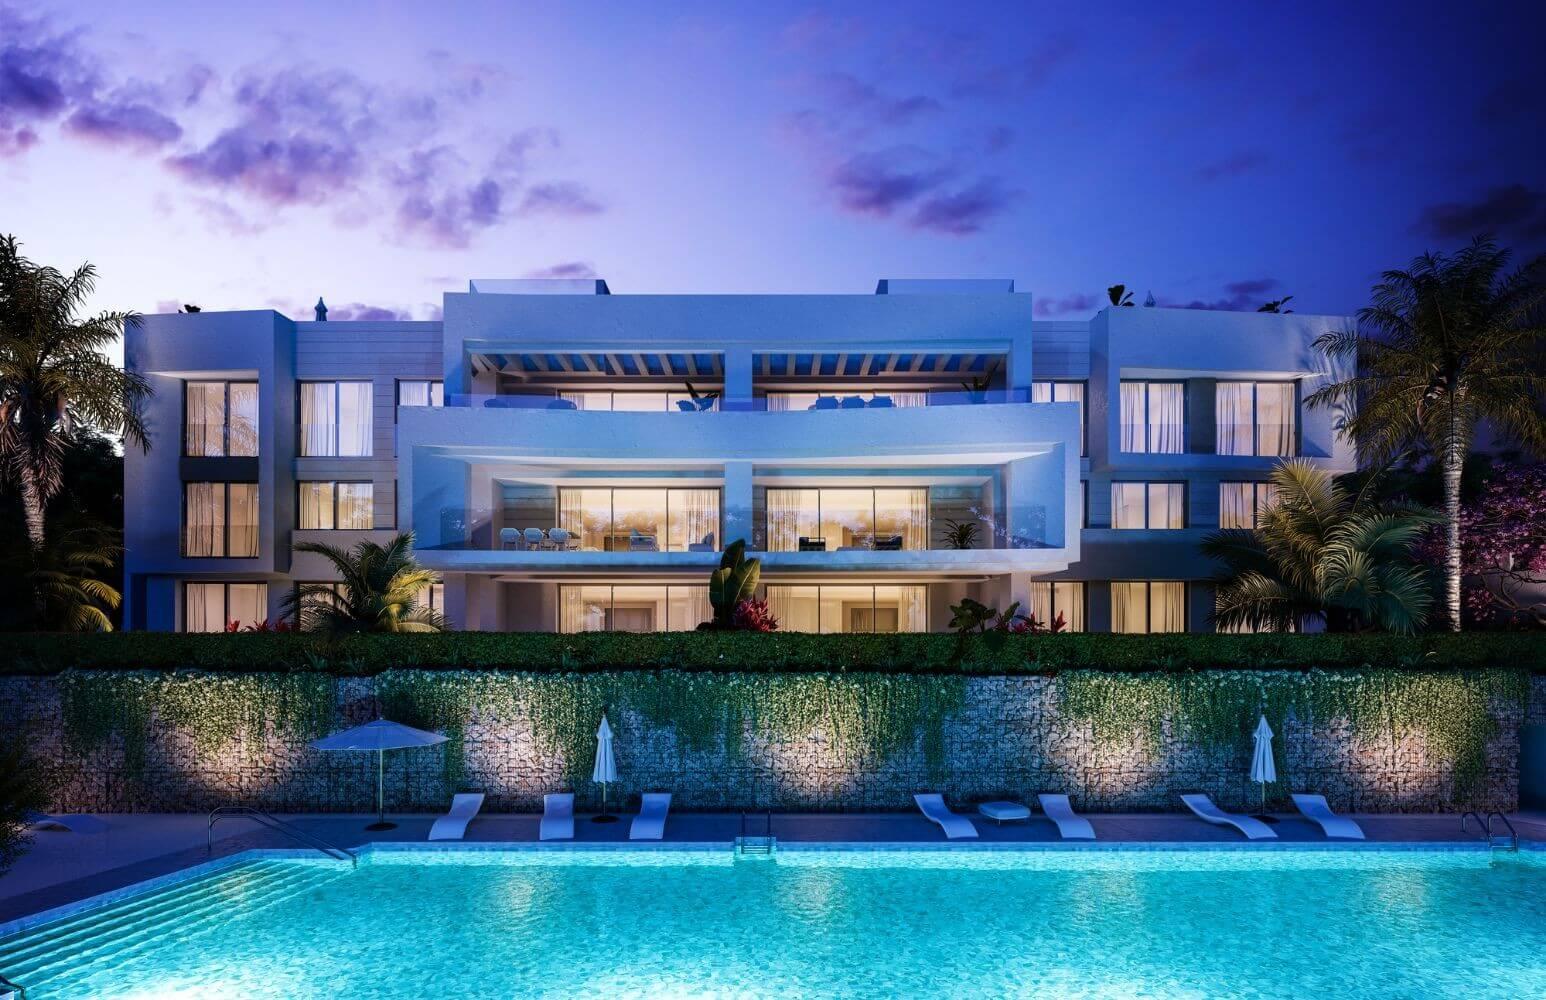 soul marbella sunset santa clara golf costa del sol appartement penthouse te koop spanje modern zeezicht